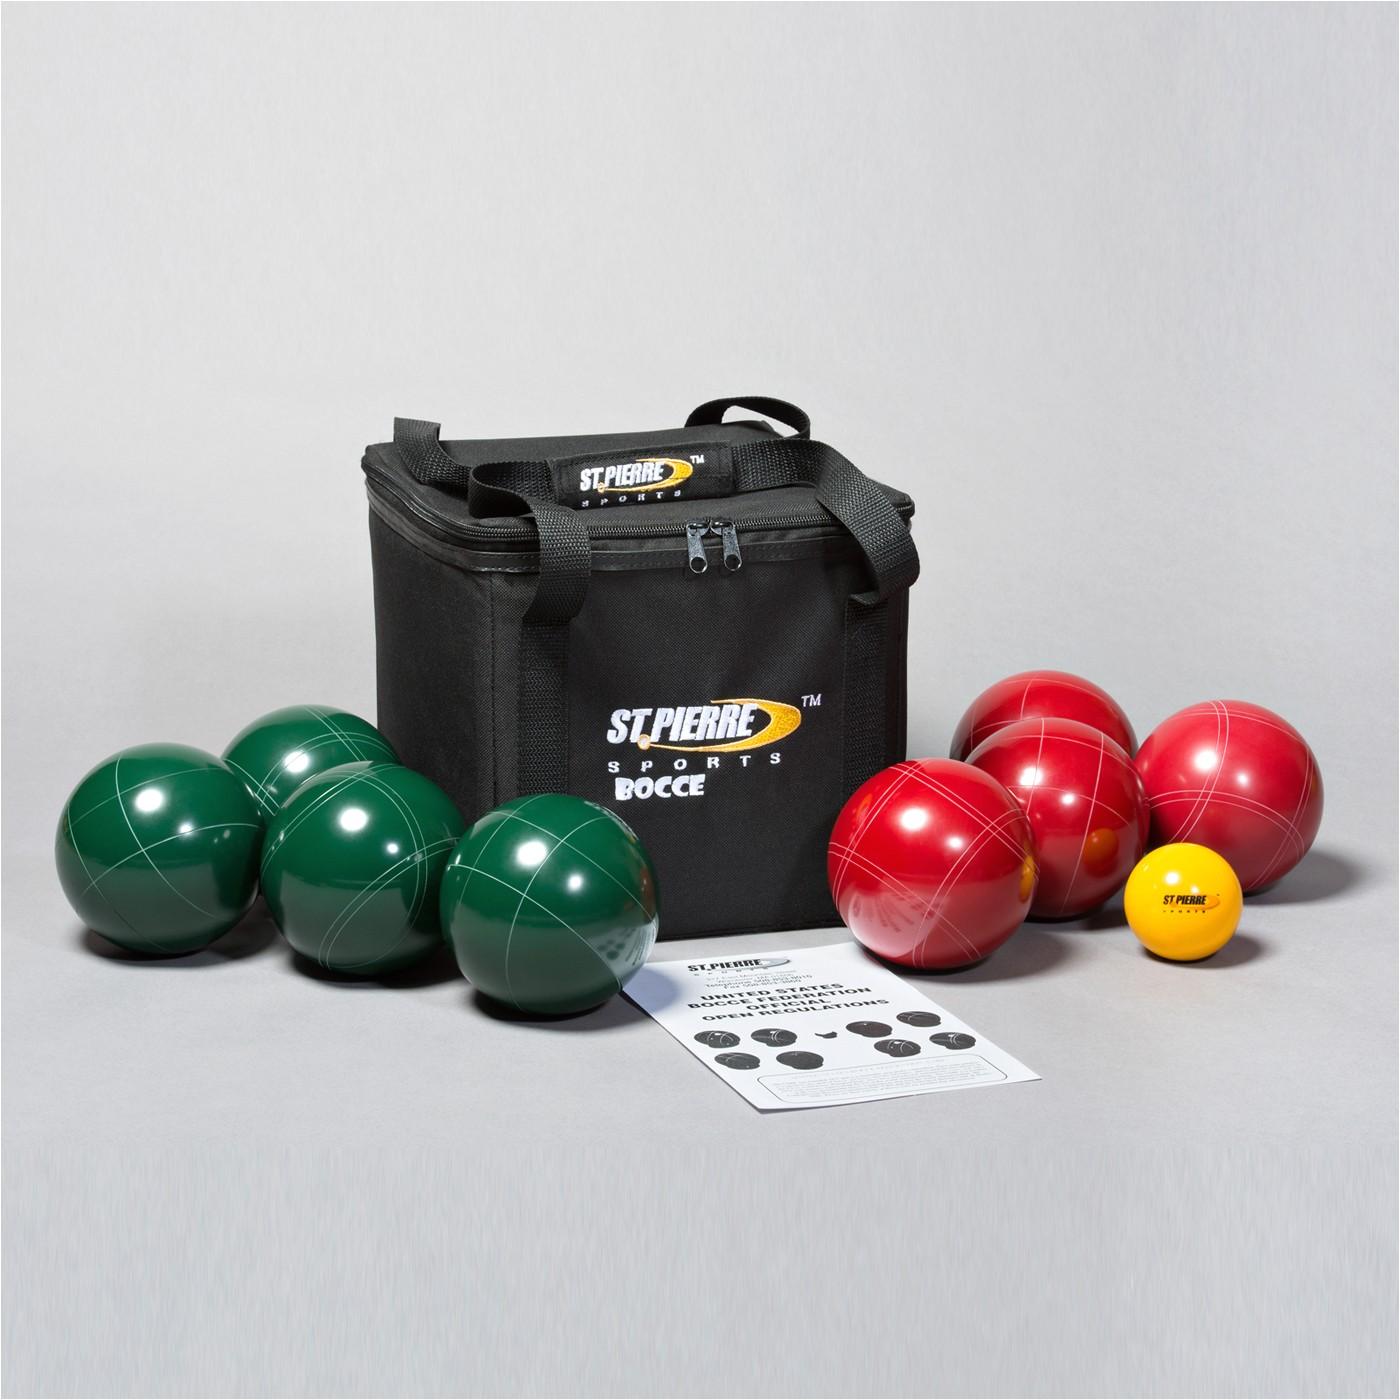 st pierre pb1 professional bocce ball set g2252086